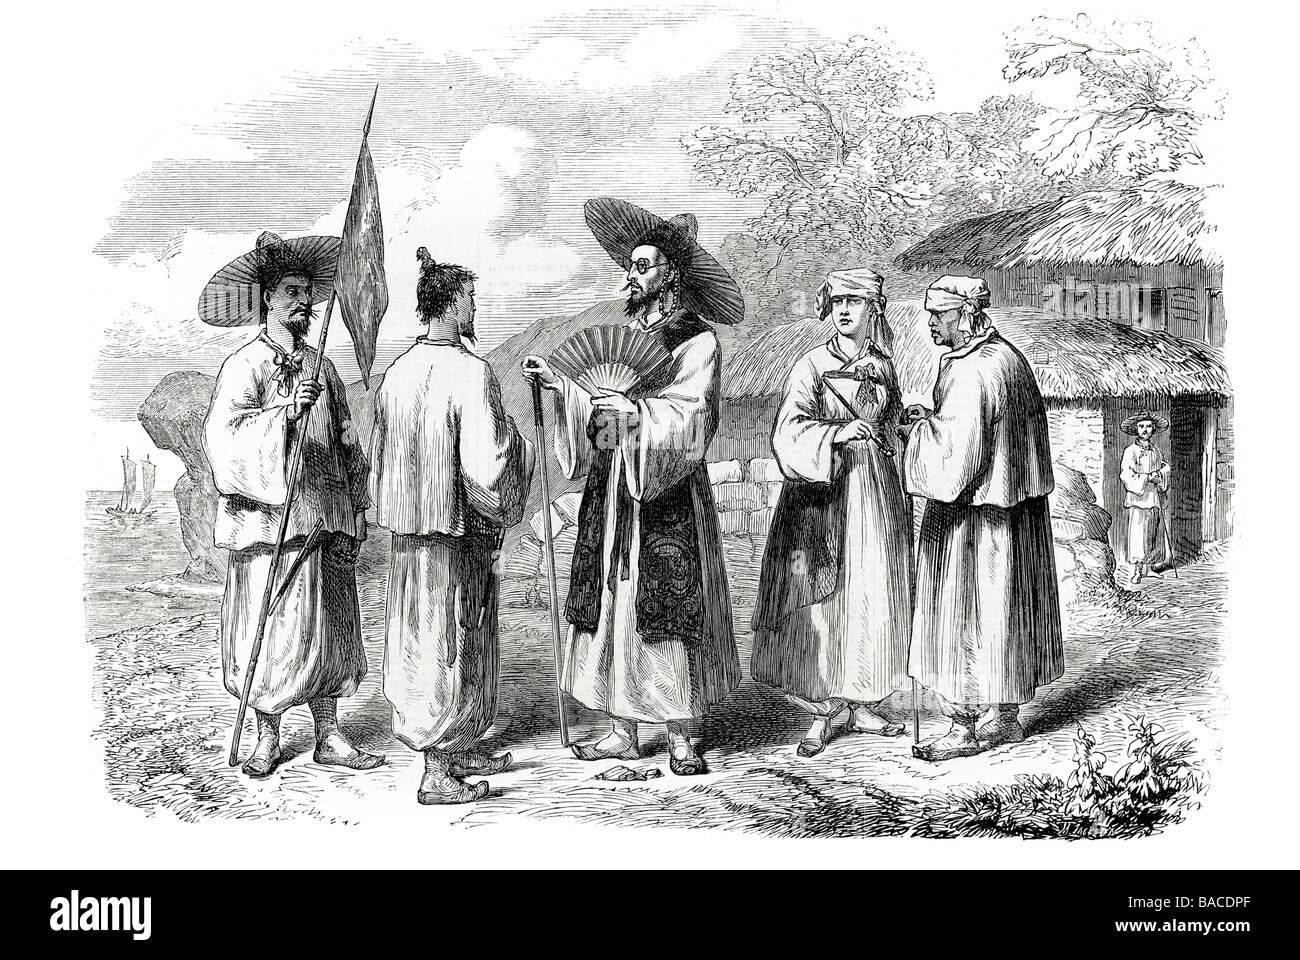 natives of korea 1865 shoe sandal straw leaves great toe exposed stockings pantaloons - Stock Image